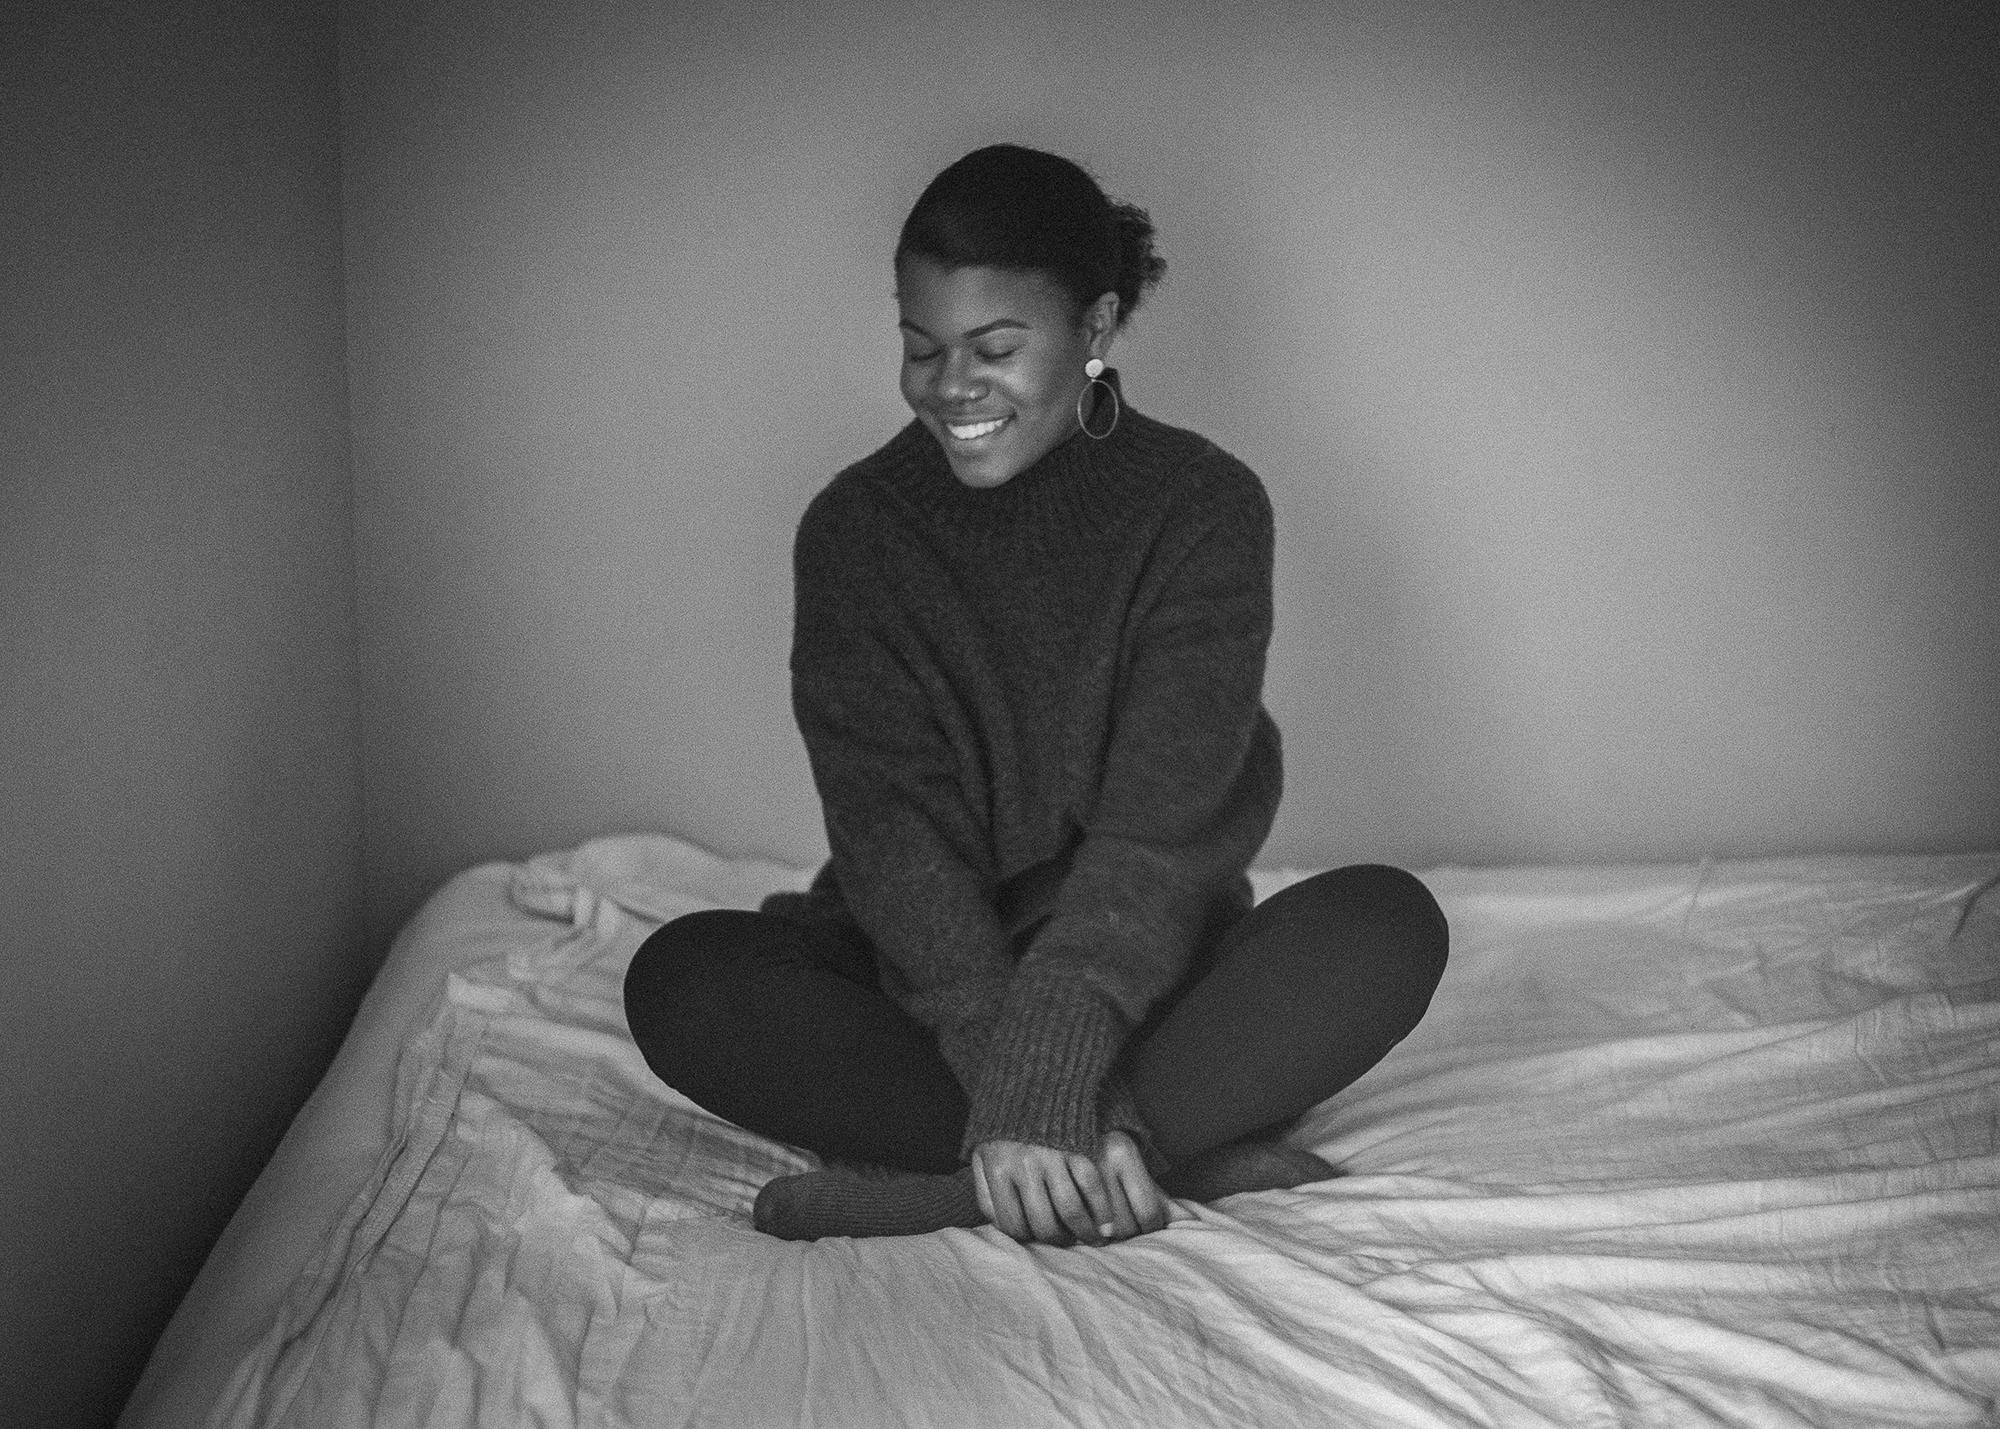 Self-portrait-in-turtleneck-sweater-by-Atlanta-photographer-Chanel-French.jpg